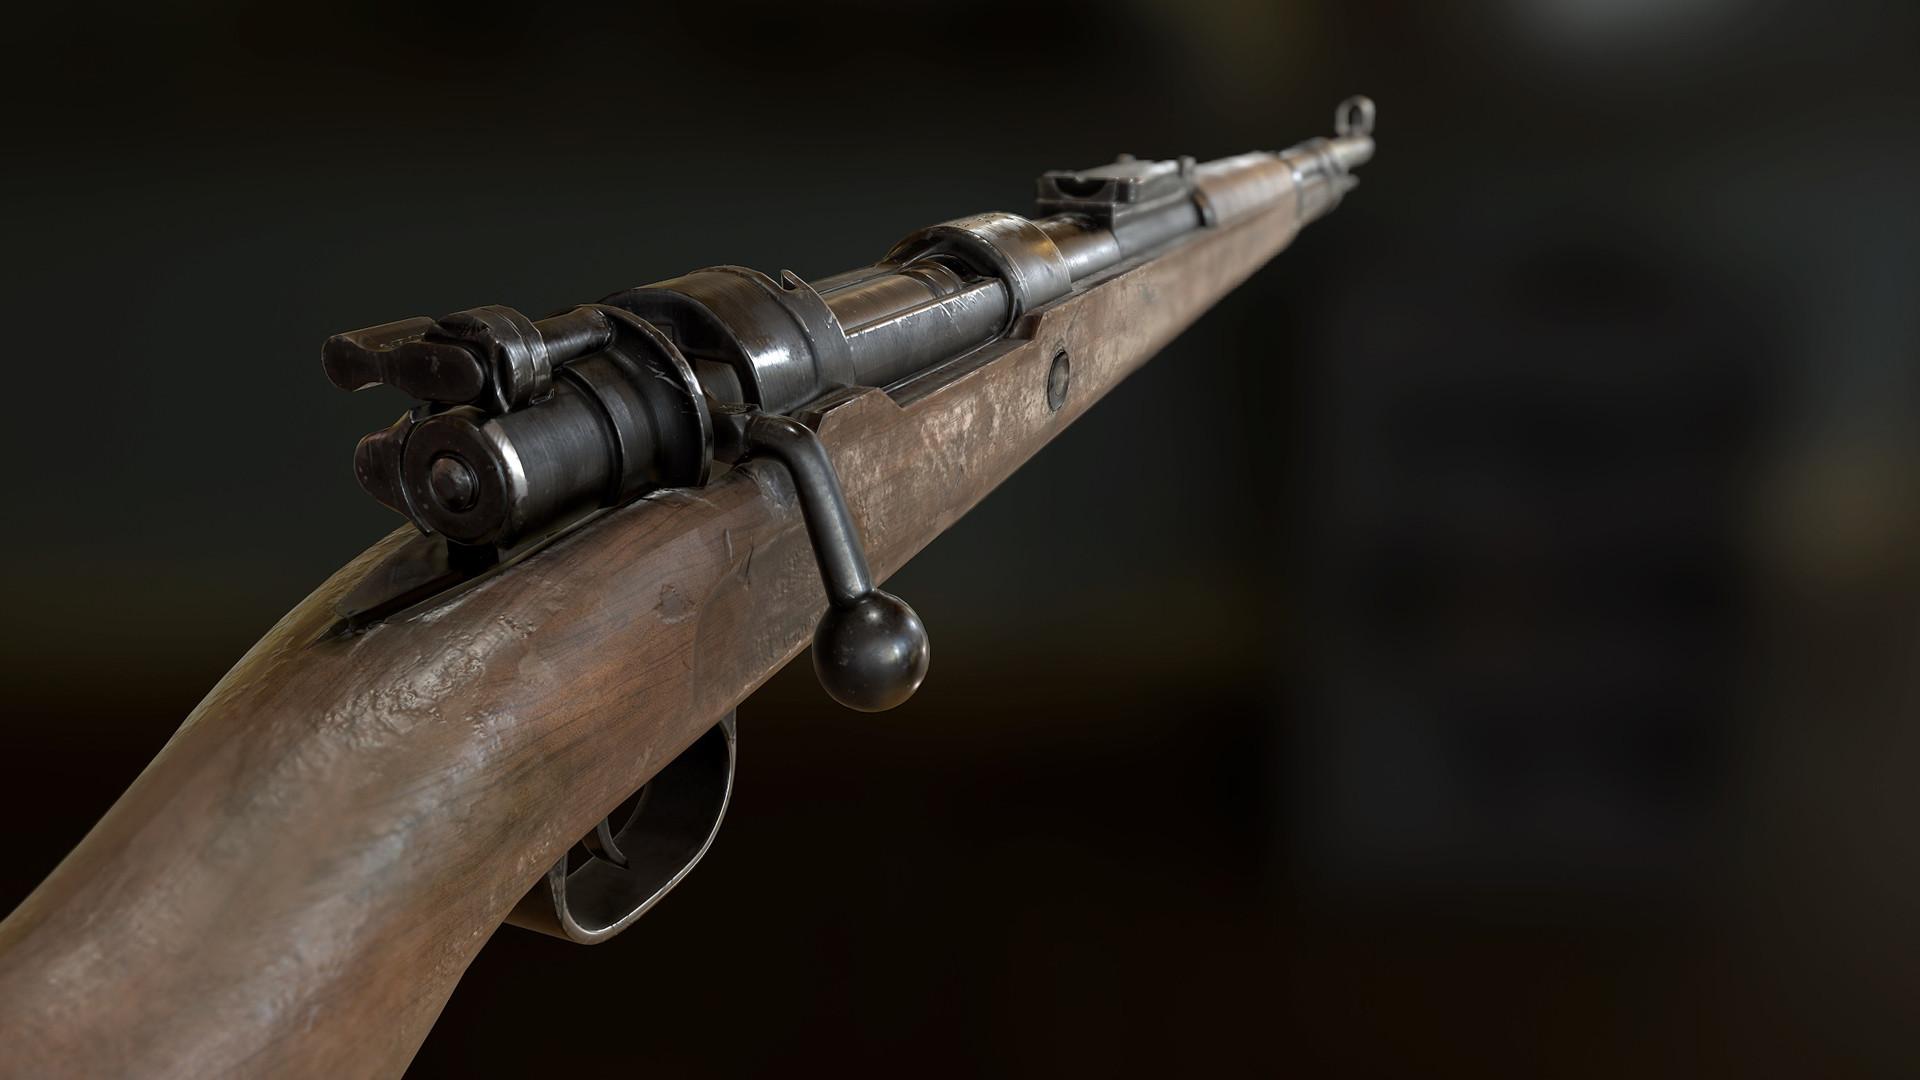 Pubg Weapons The Best Battlegrounds Guns And Attachments Pc Gamer